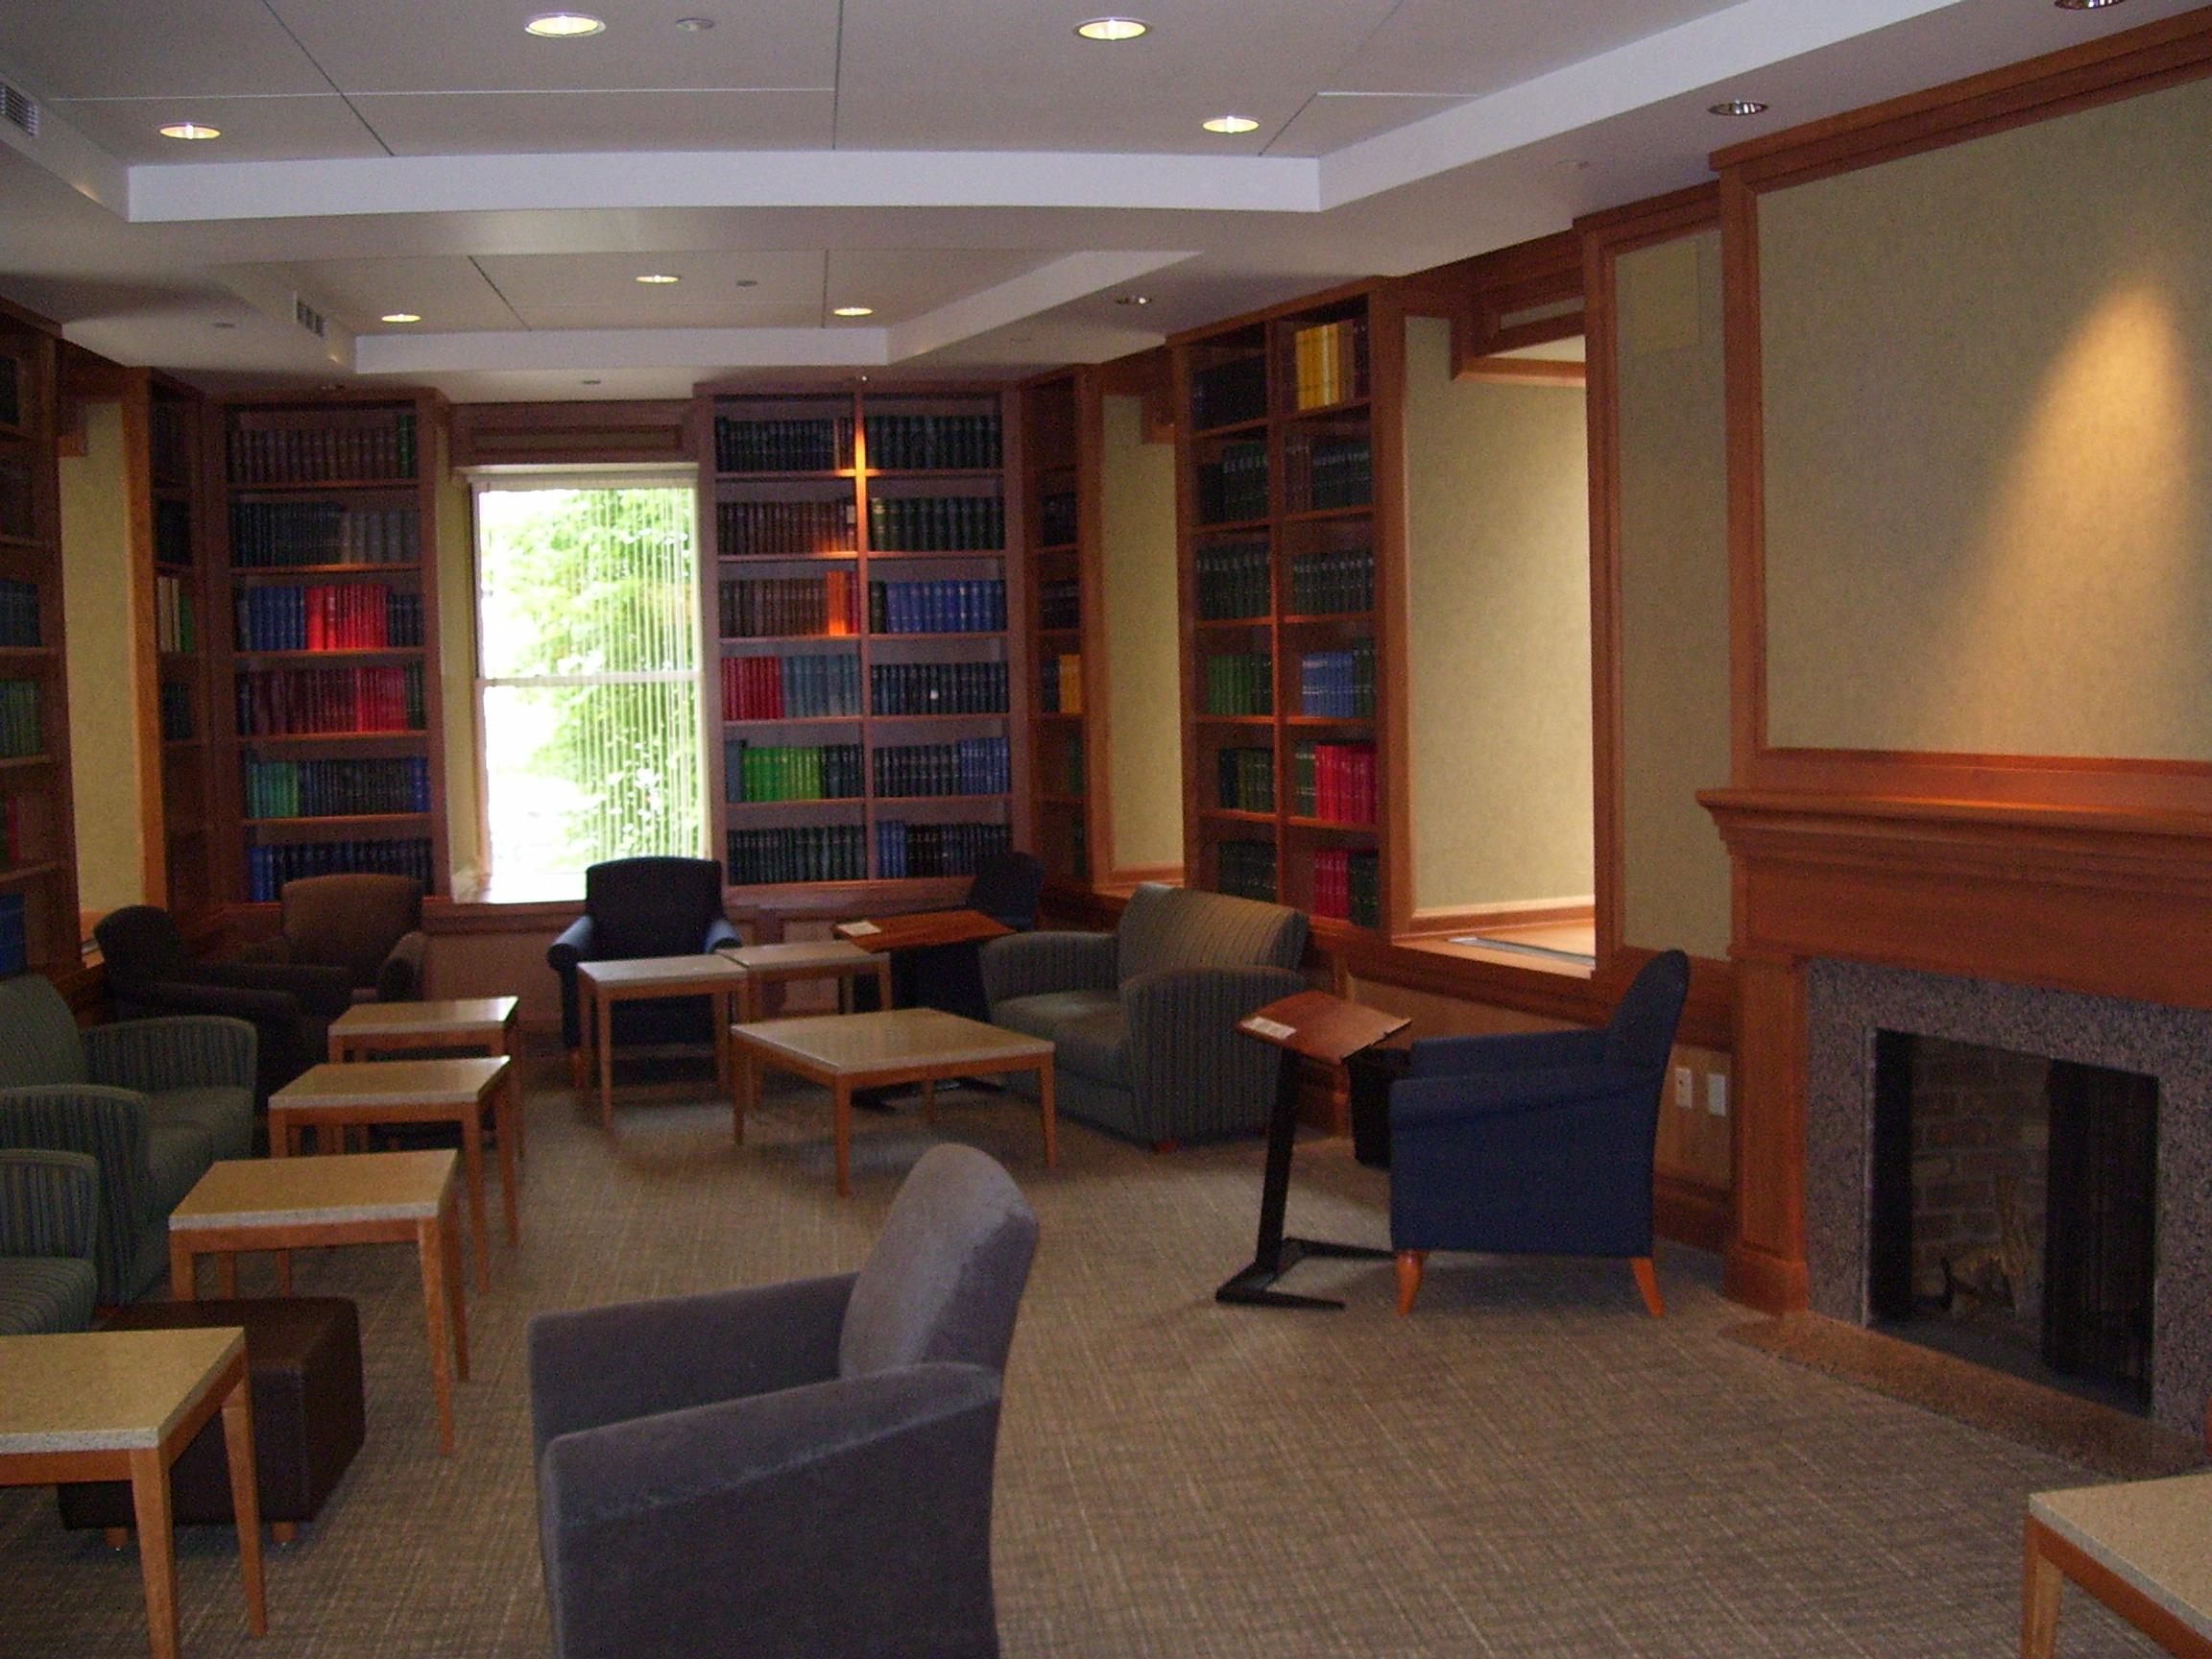 Suffolk University Sawyer Library